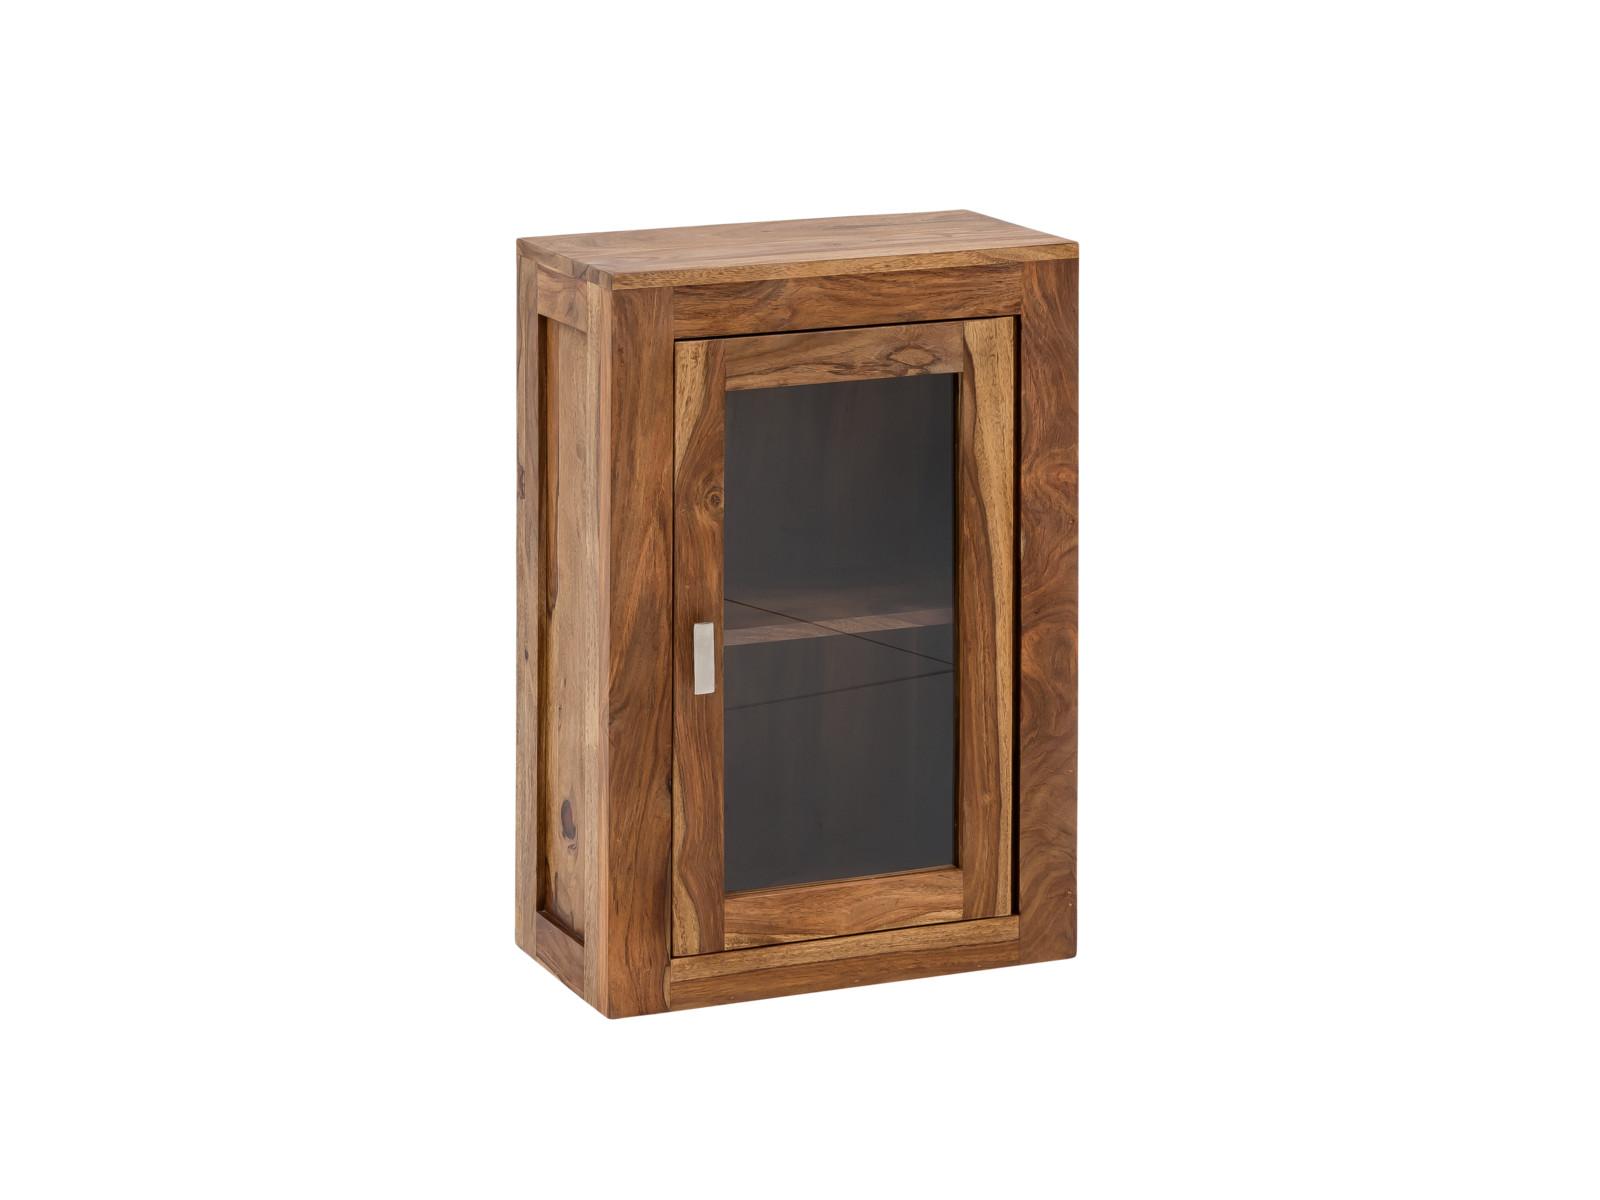 Bad Hangeschrank Palisander Wandschrank Medizinschrank Massiv Holz